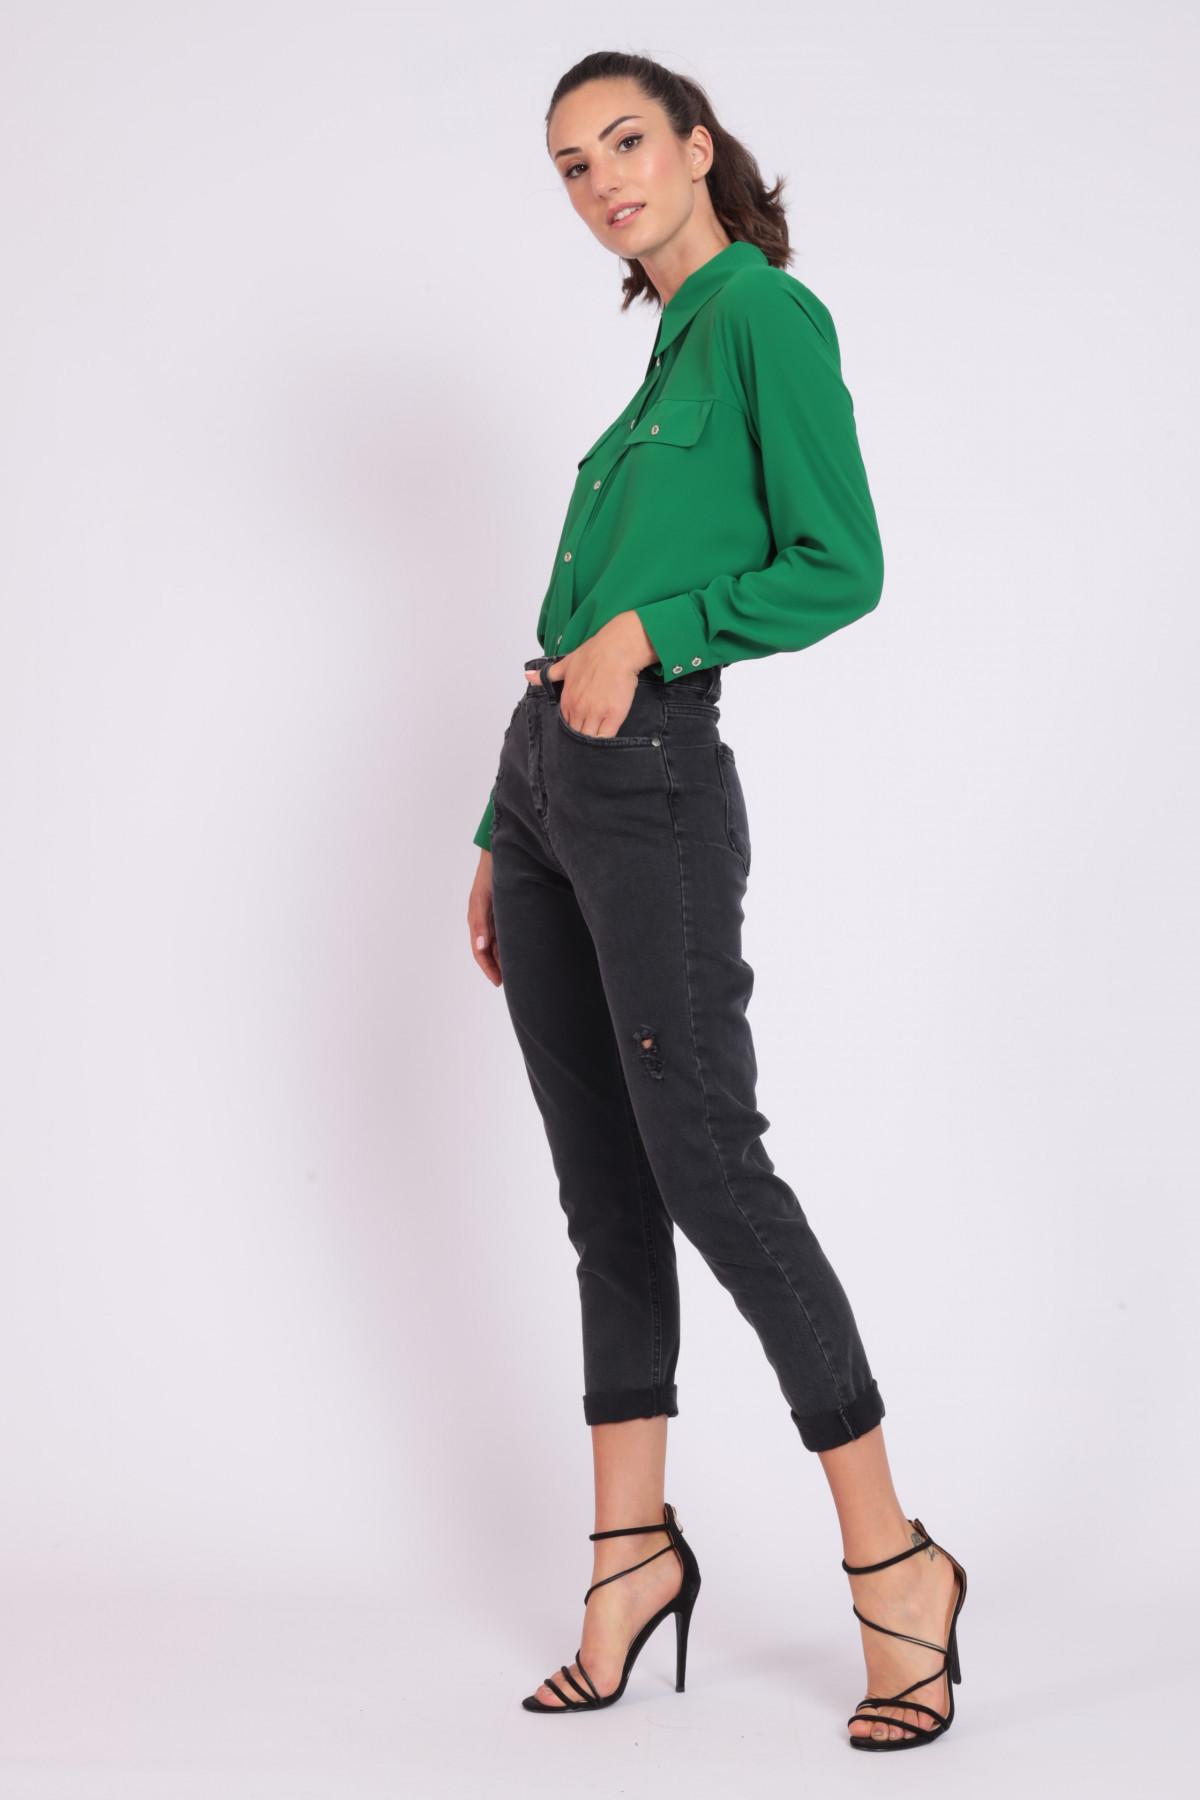 5 Pockets Cigarette High Waist Jeans